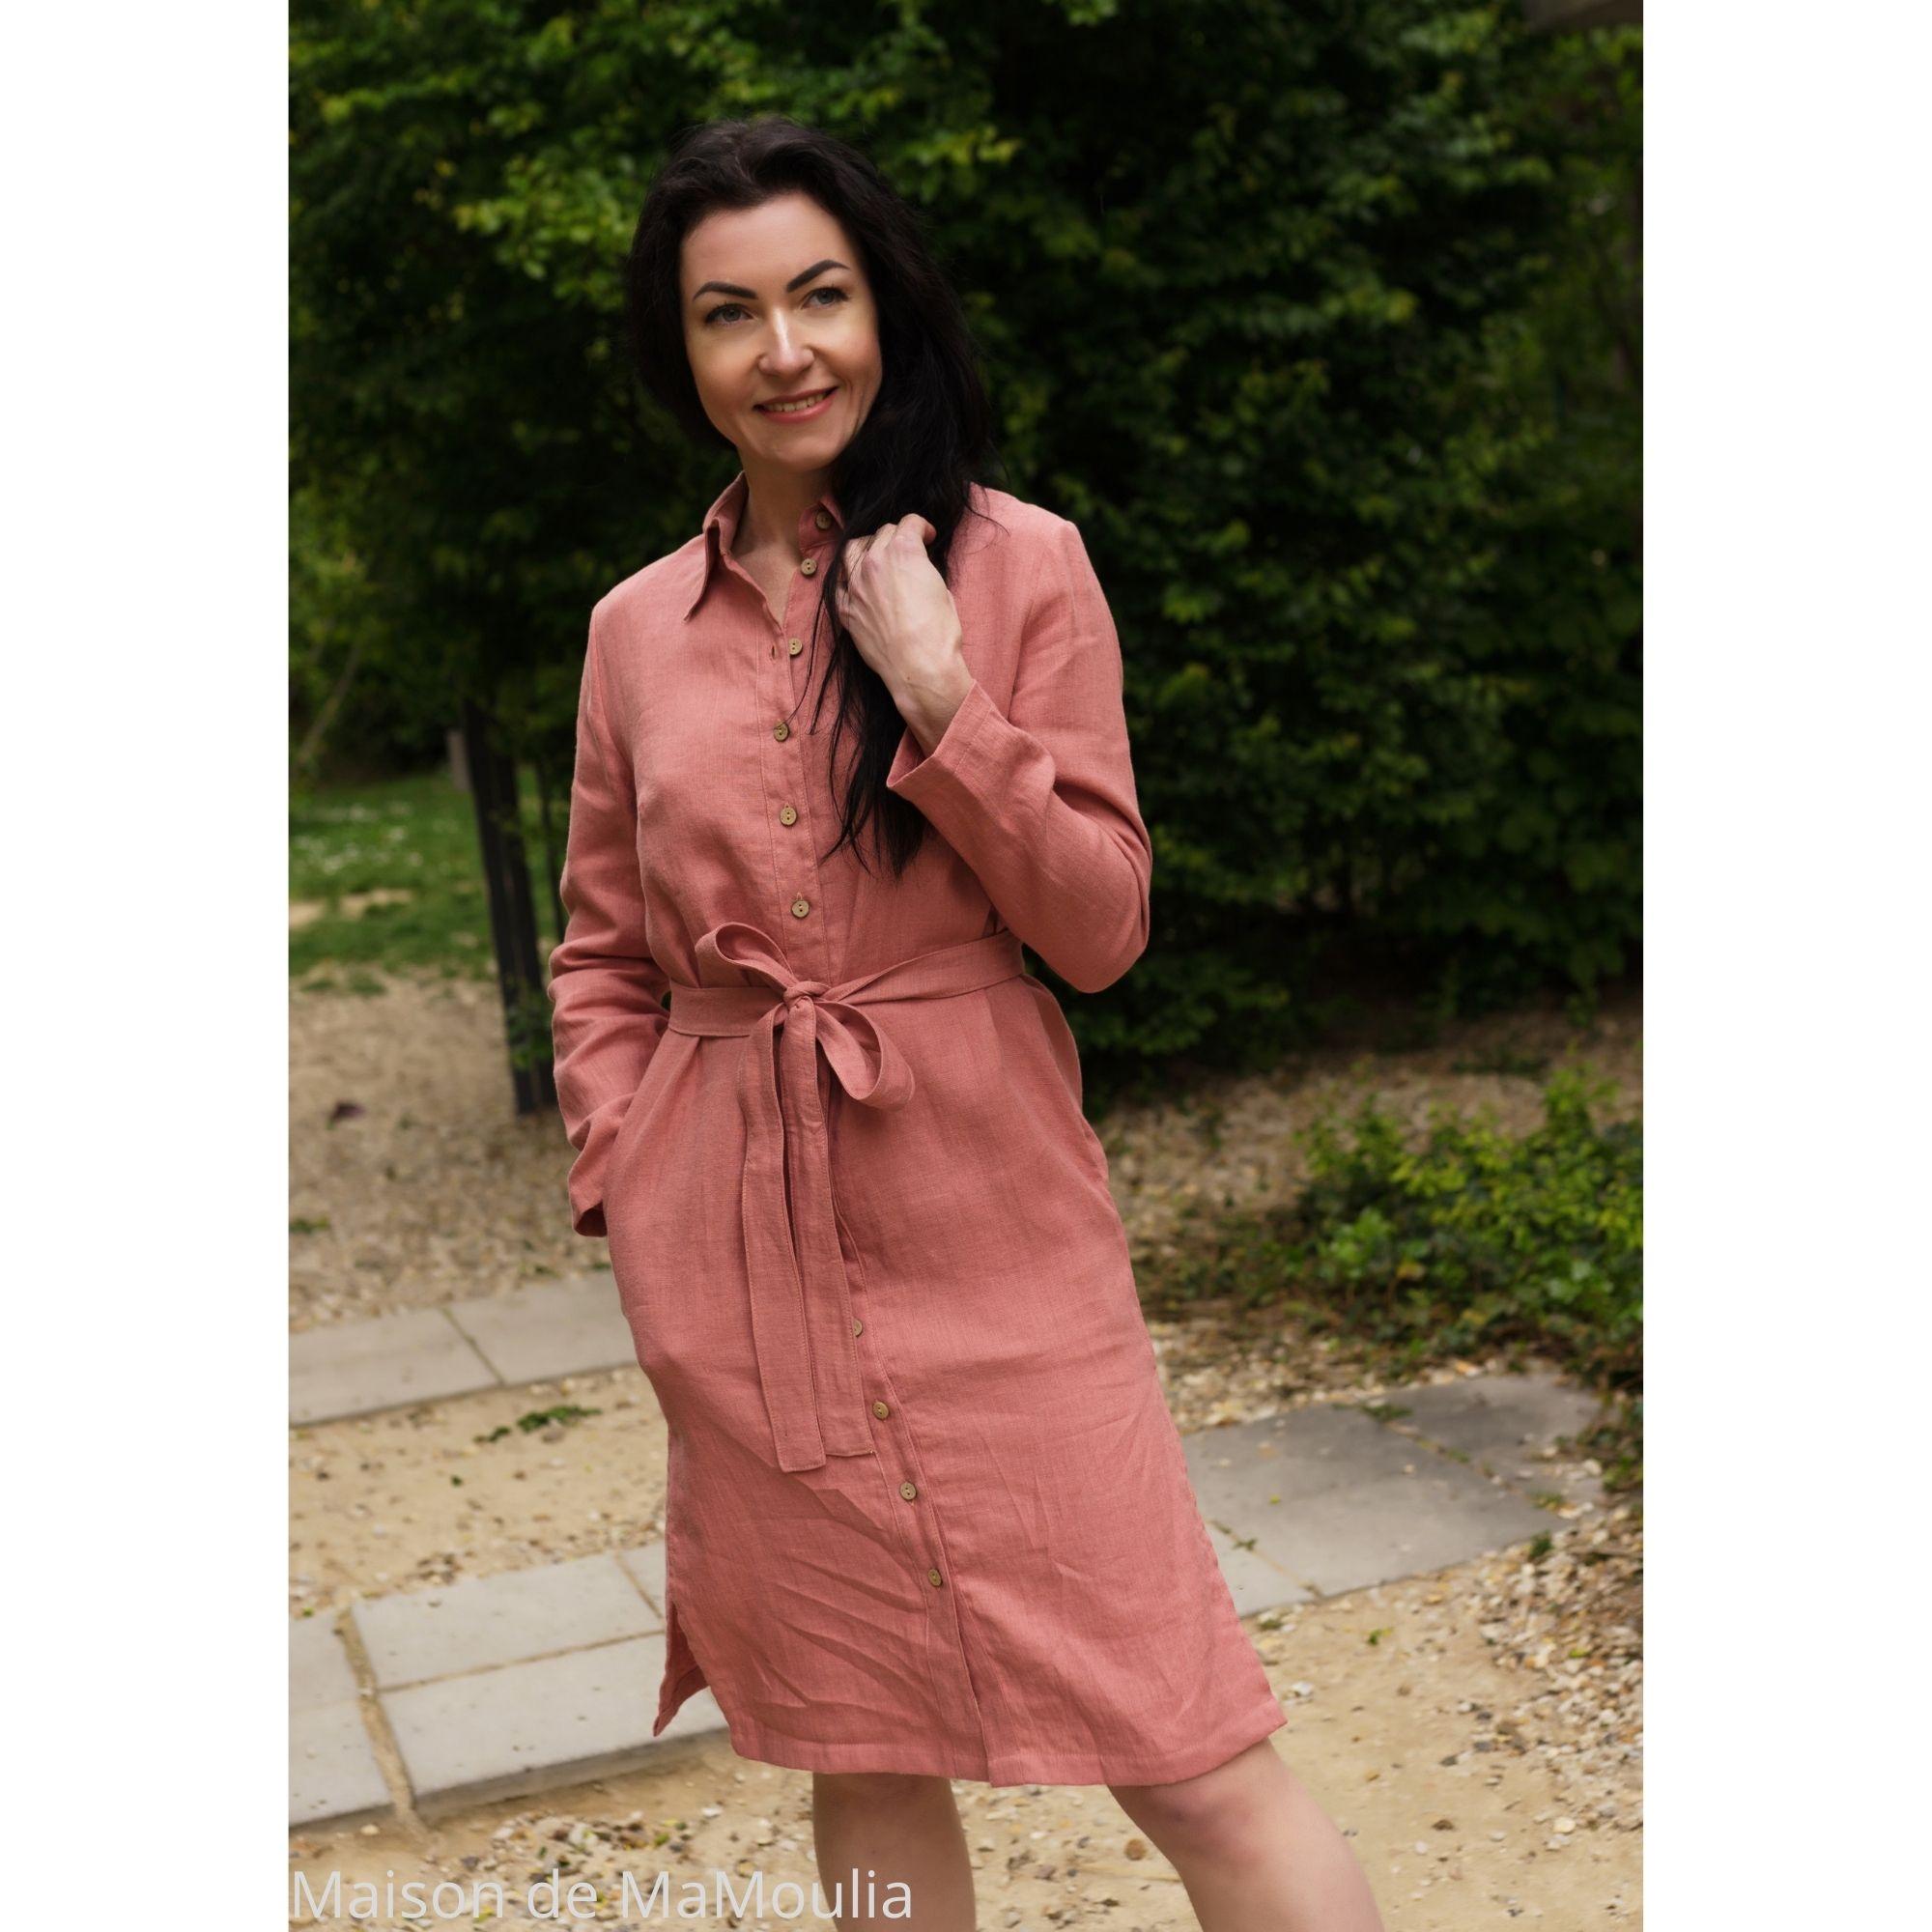 SIMPLY GREY - Robe-chemise pour femme - 100% lin lavé - Rose